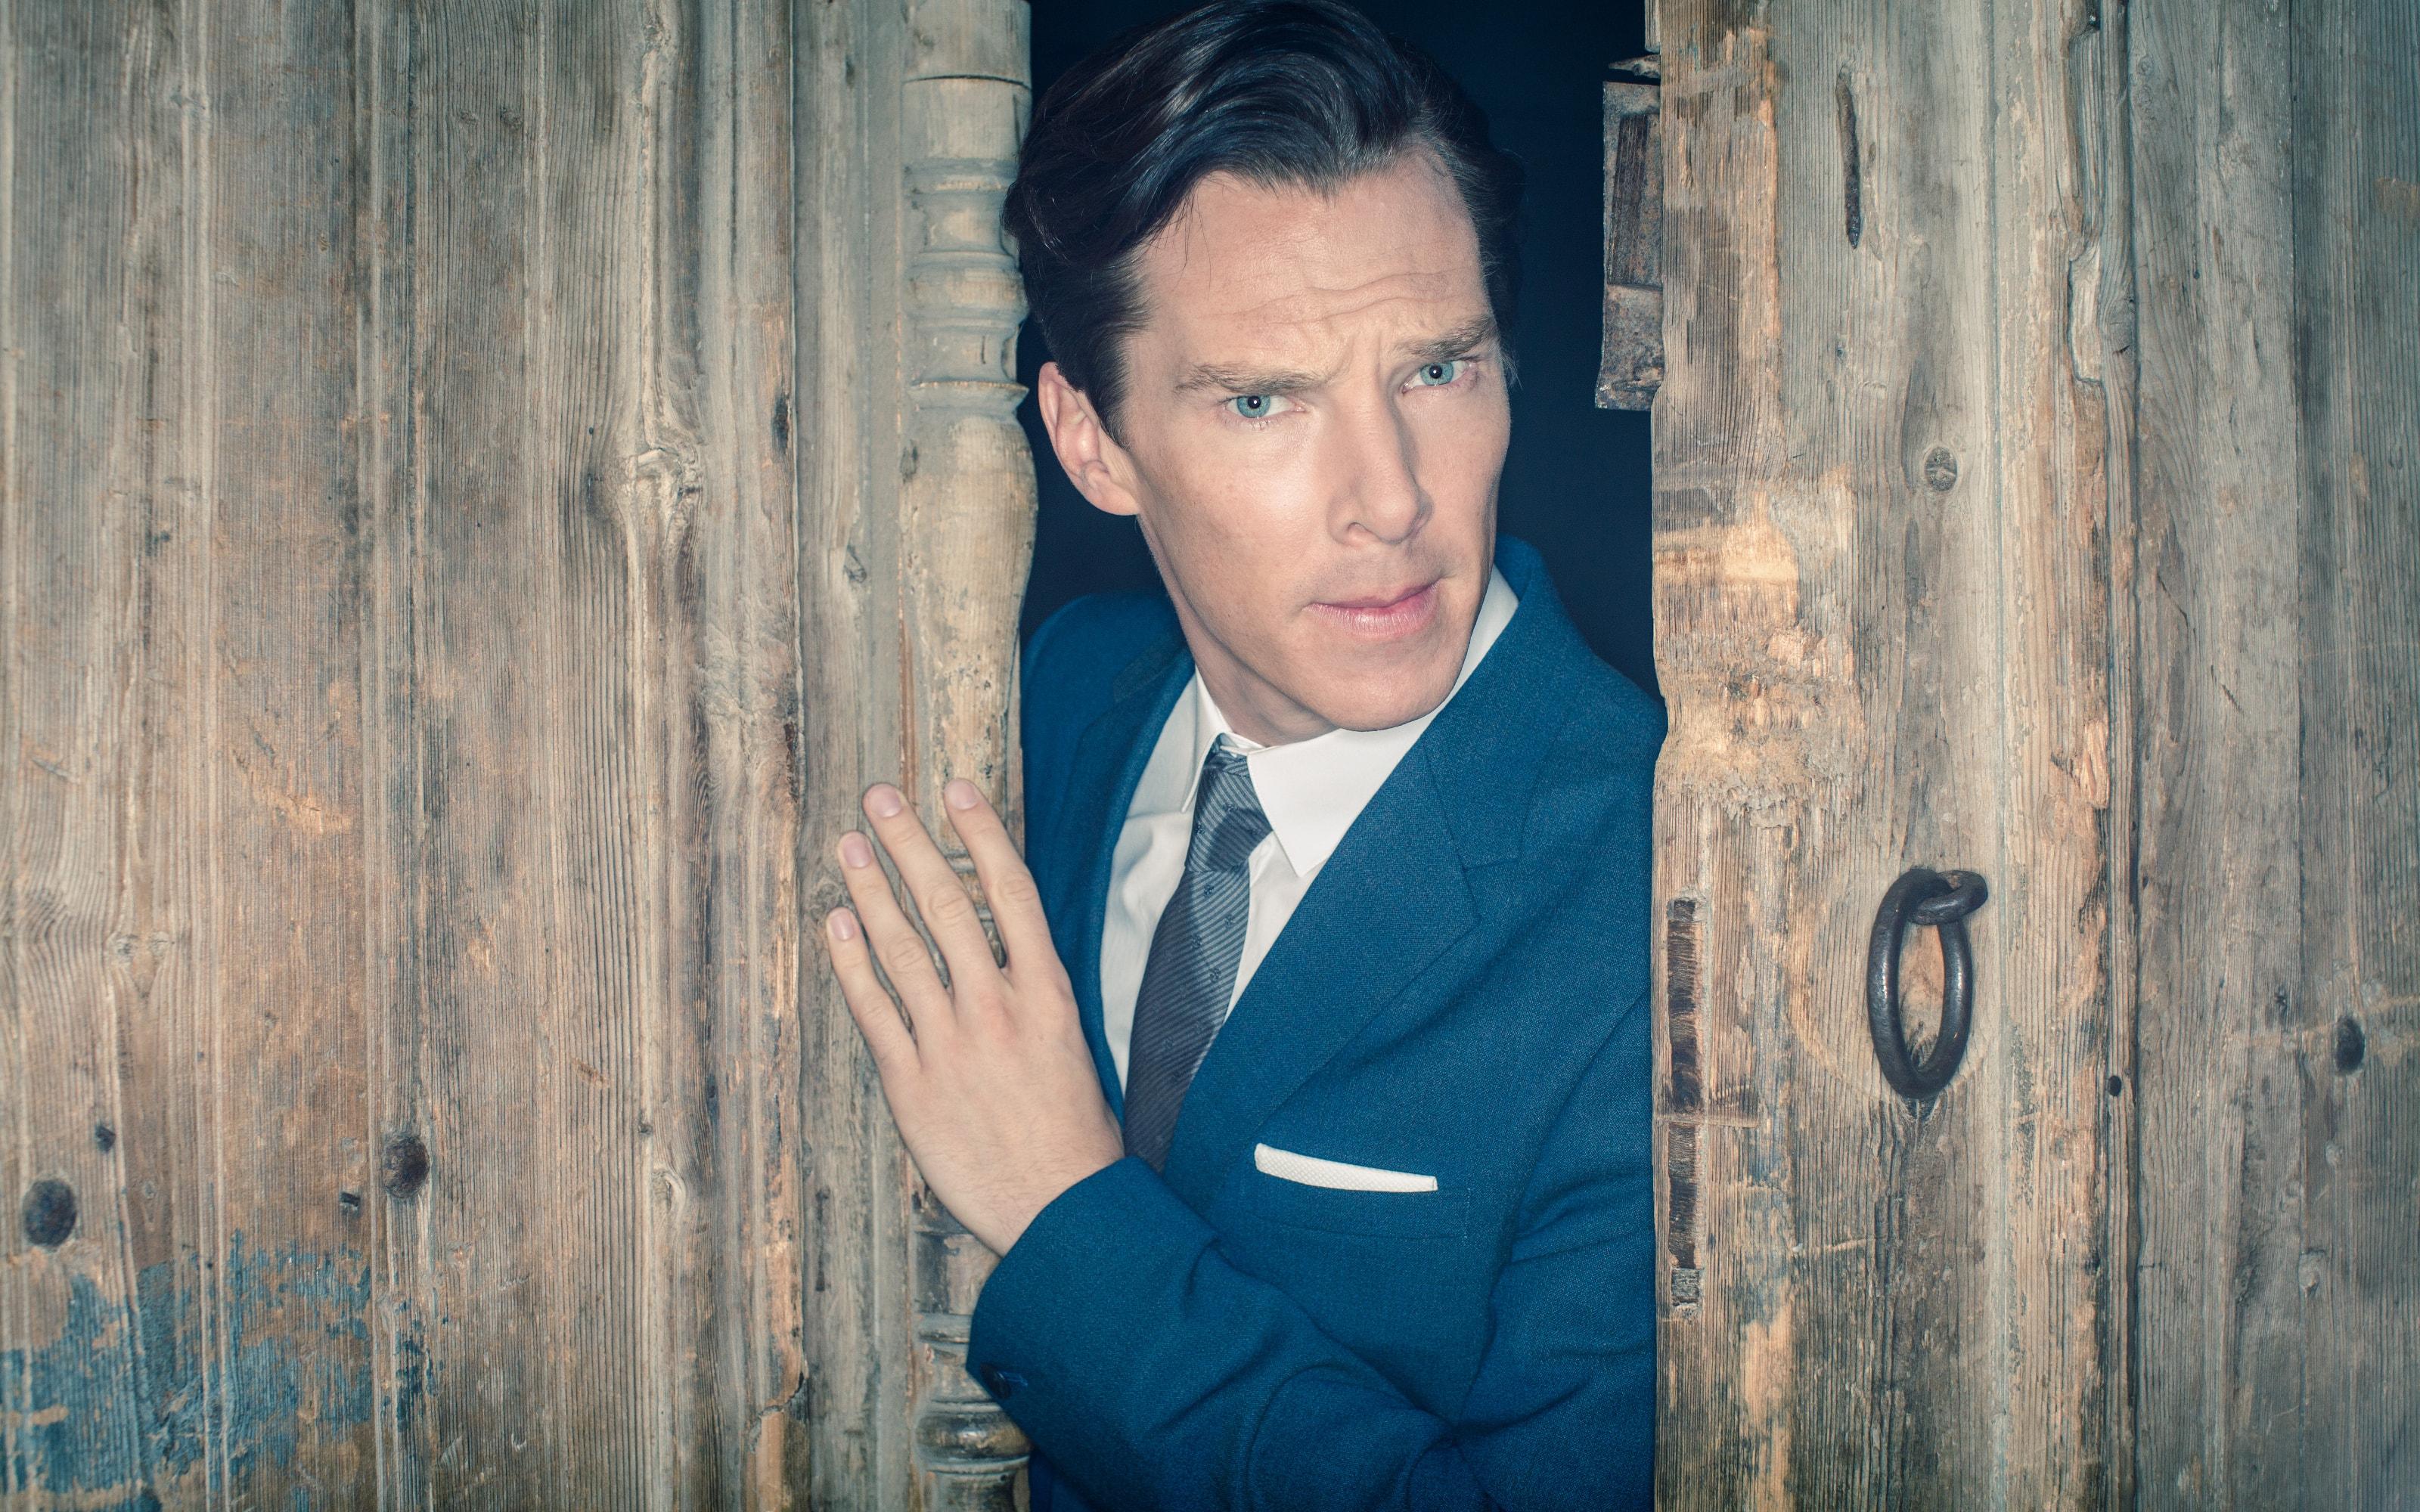 Benedict Cumberbatch HQ wallpapers